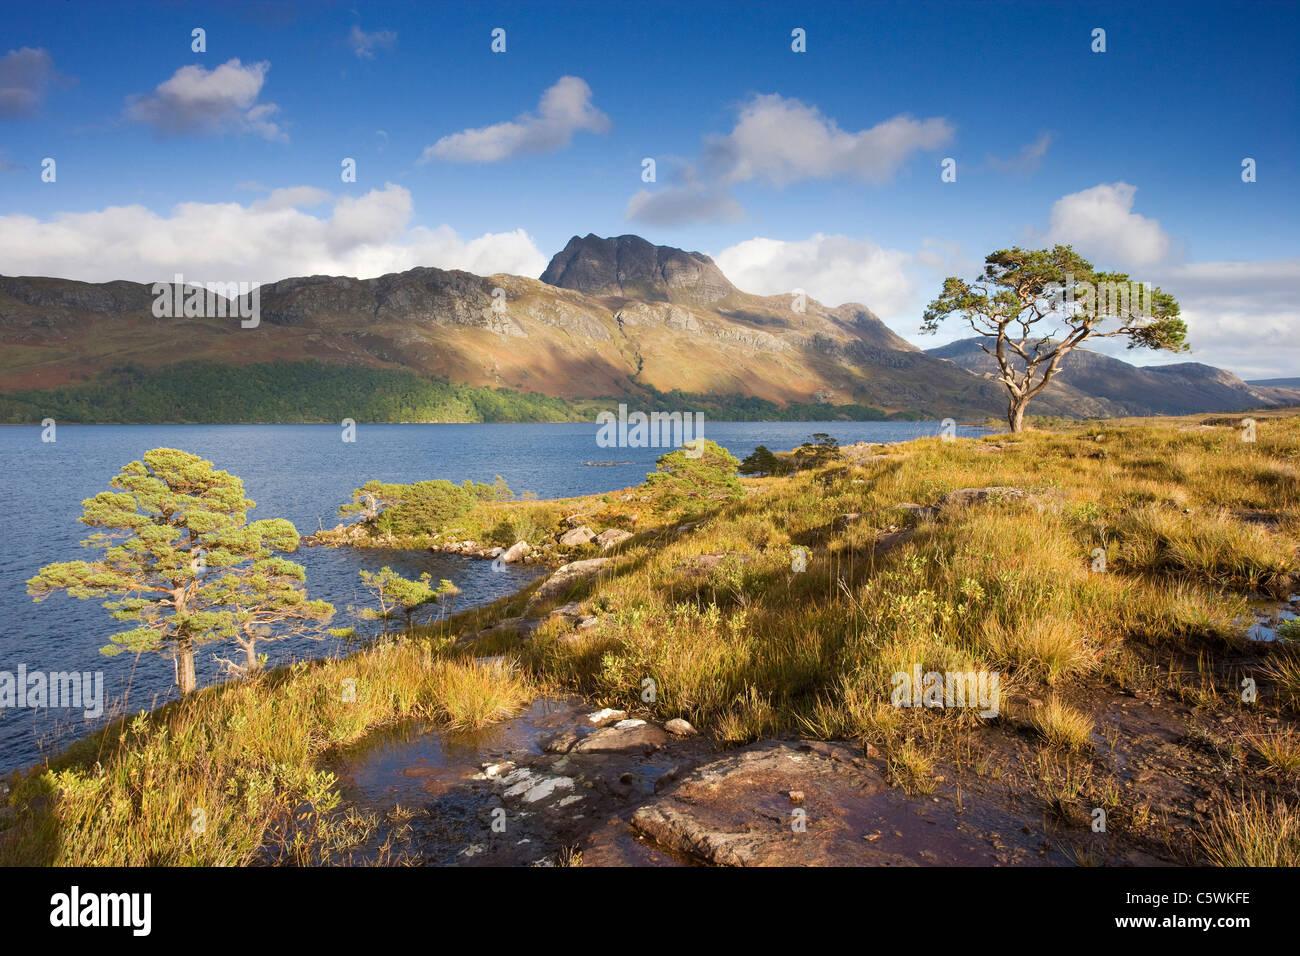 Loch Maree and Slioch, Scotland, Great Britain. - Stock Image